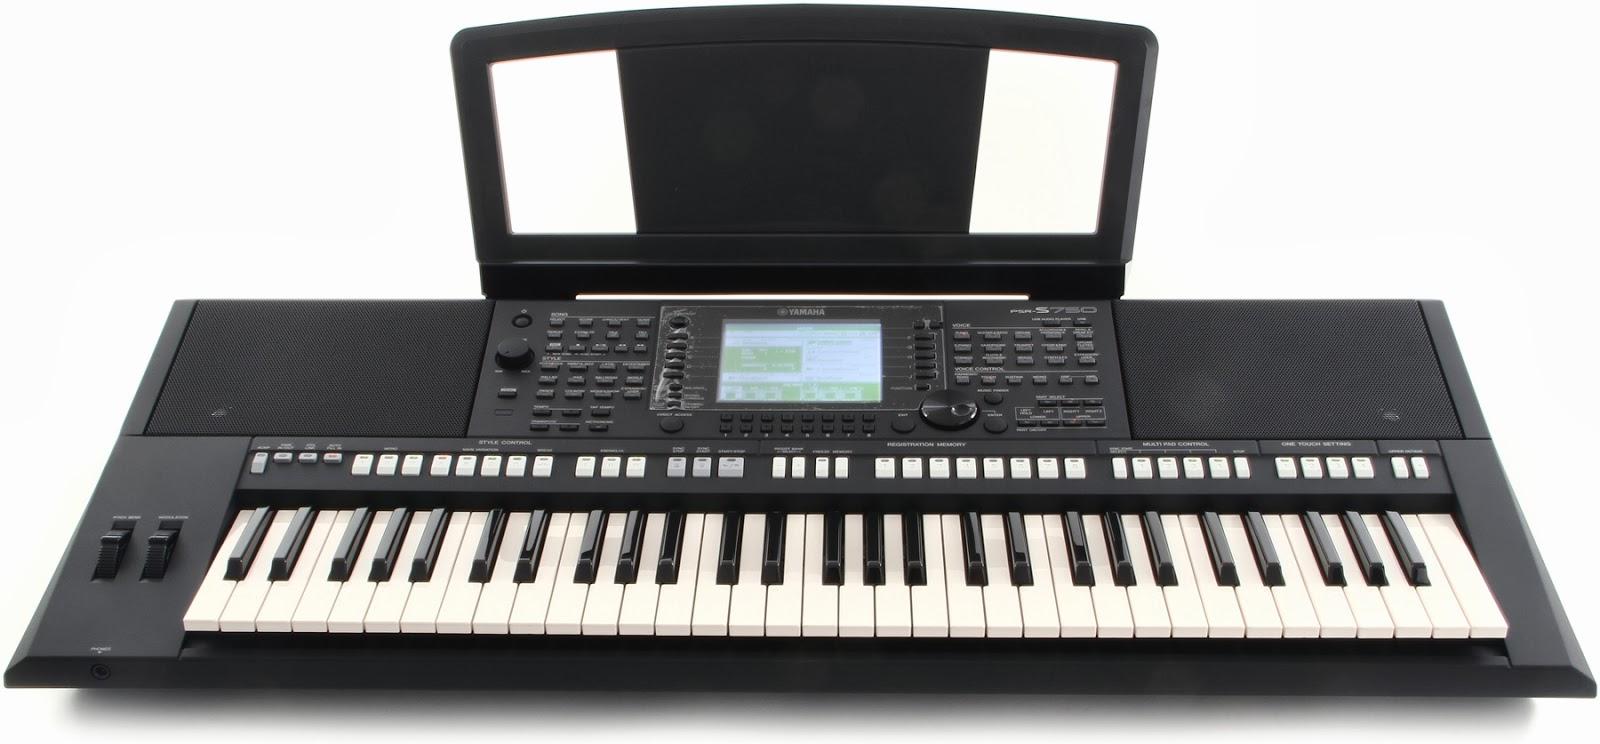 optimum musica yamaha keyboard digital piano. Black Bedroom Furniture Sets. Home Design Ideas